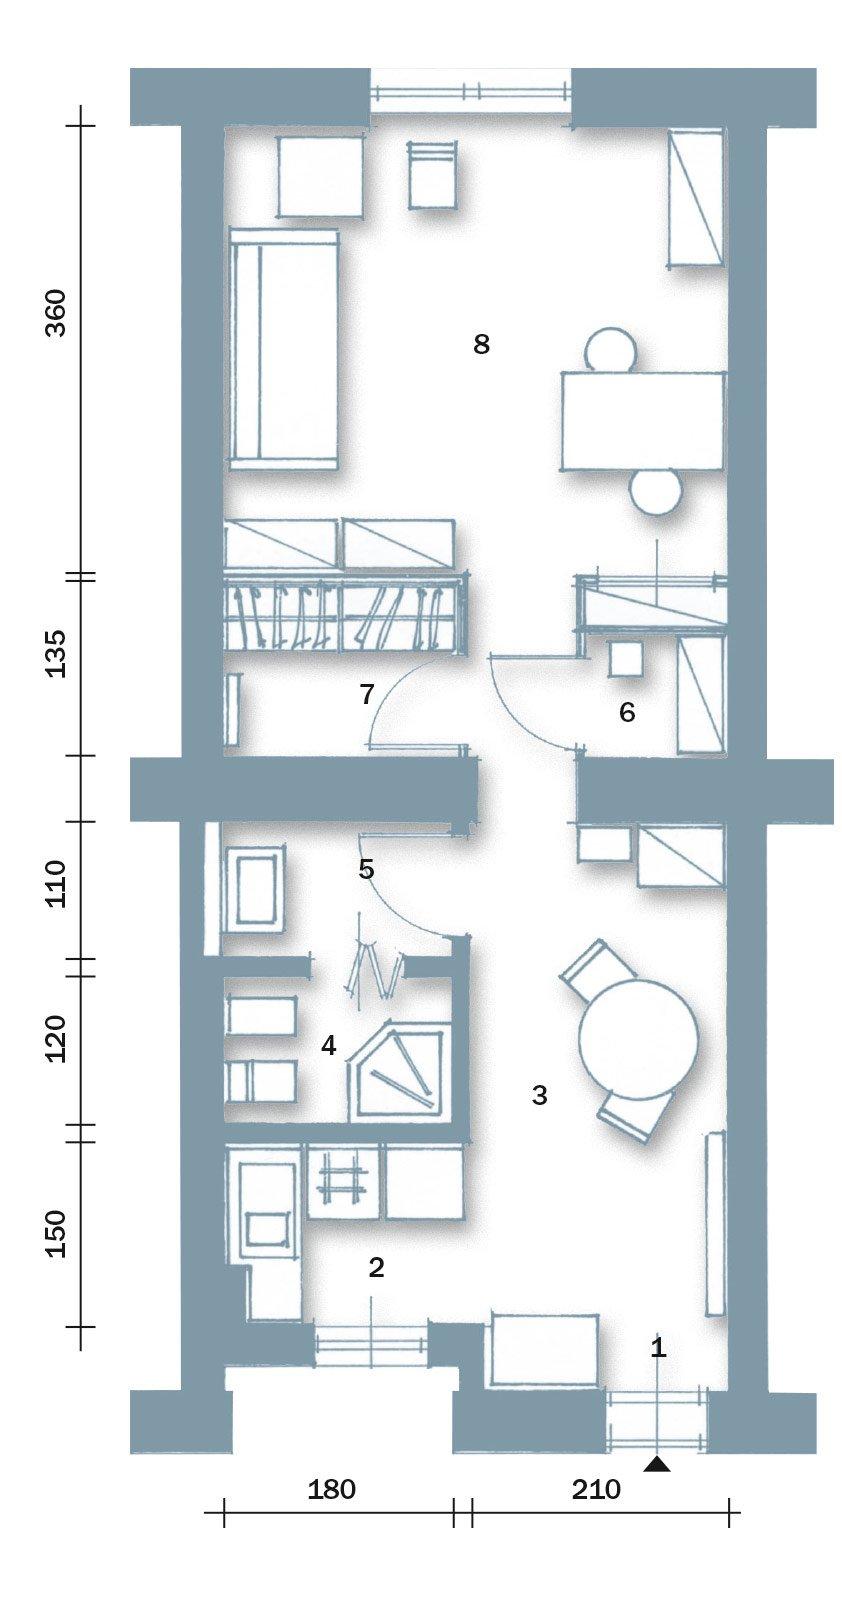 Bilocale di 40 mq una casa fai da te cose di casa for 8 piani di casa di camera da letto